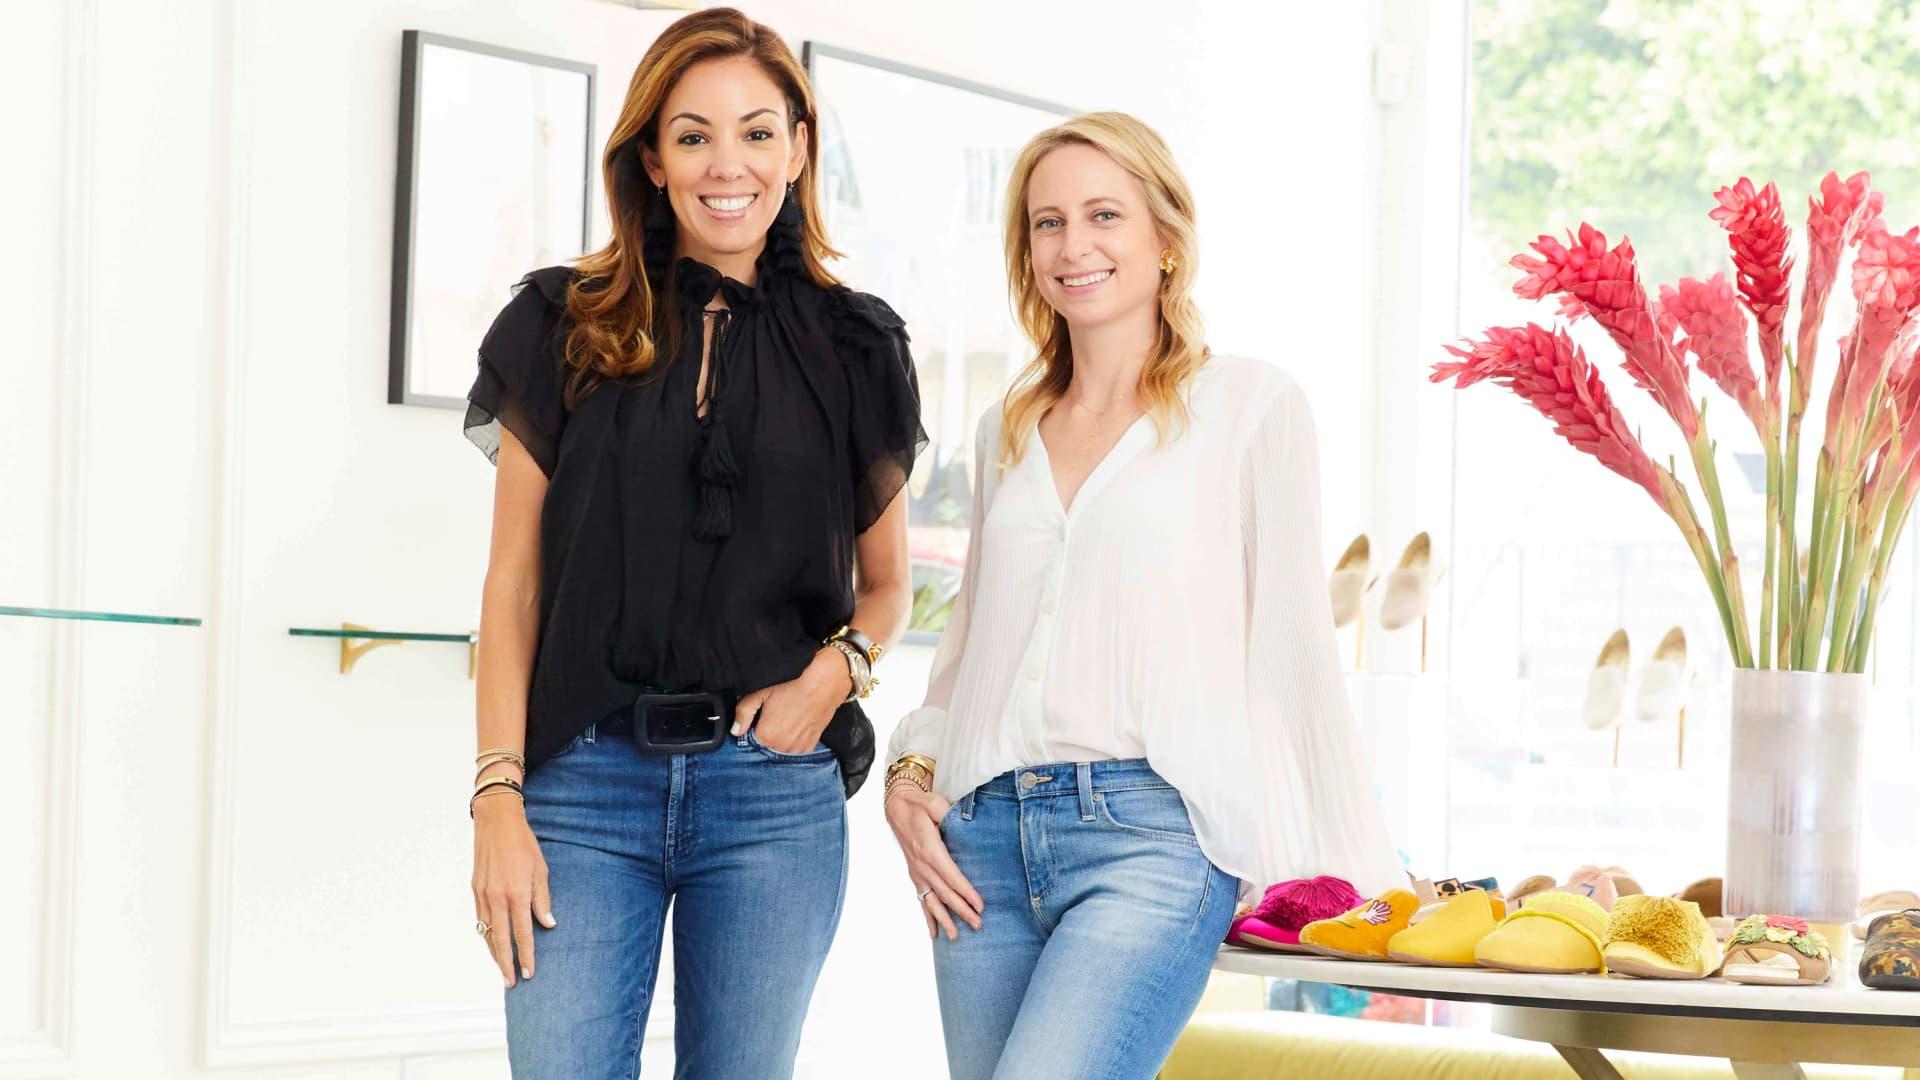 Birdies founders Bianca Gates and Marisa Sharkey.